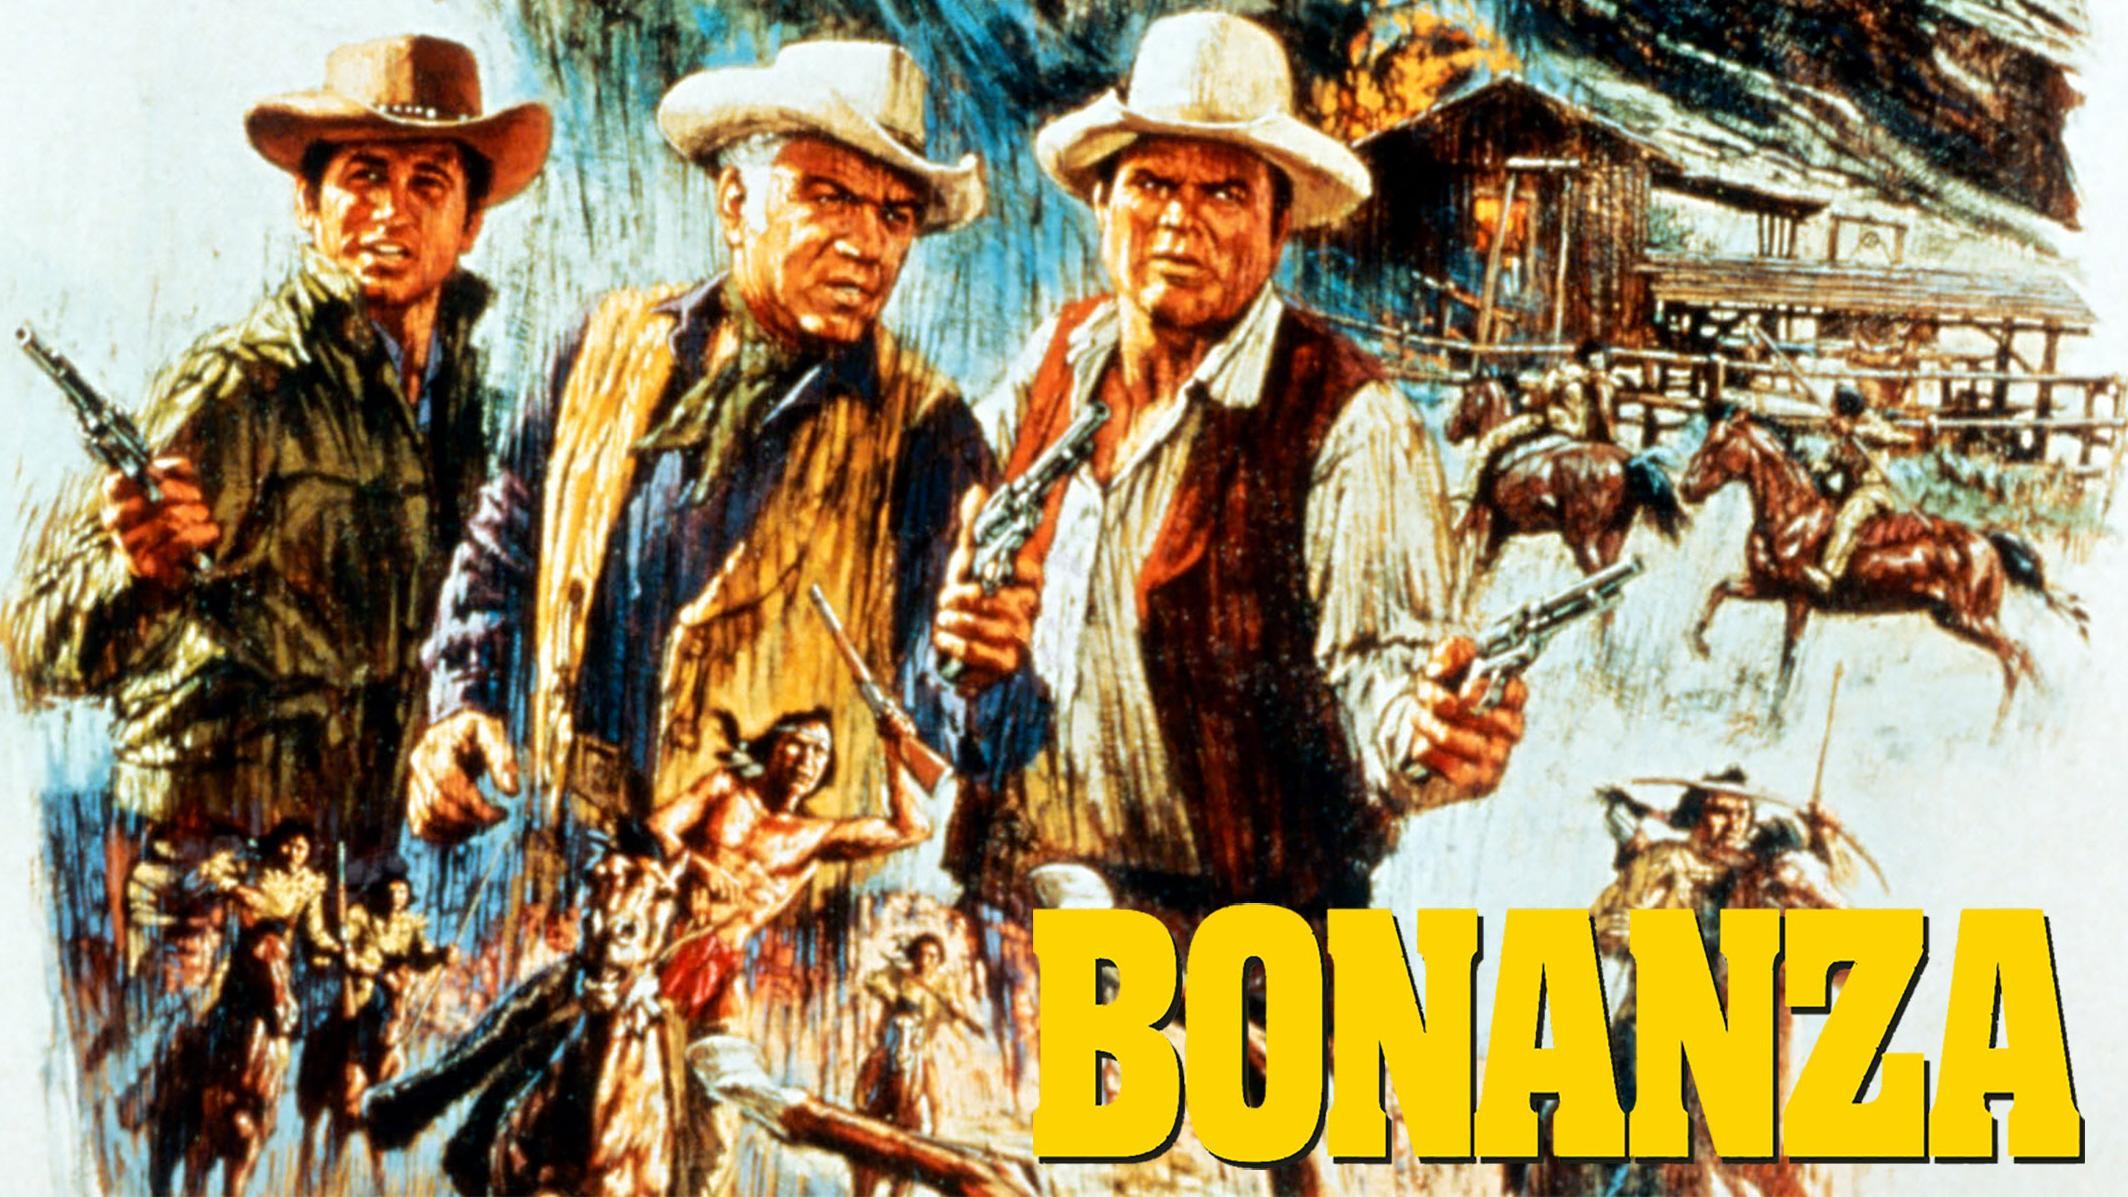 ce8cd69a0506 Stream And Watch Bonanza Online   Sling TV